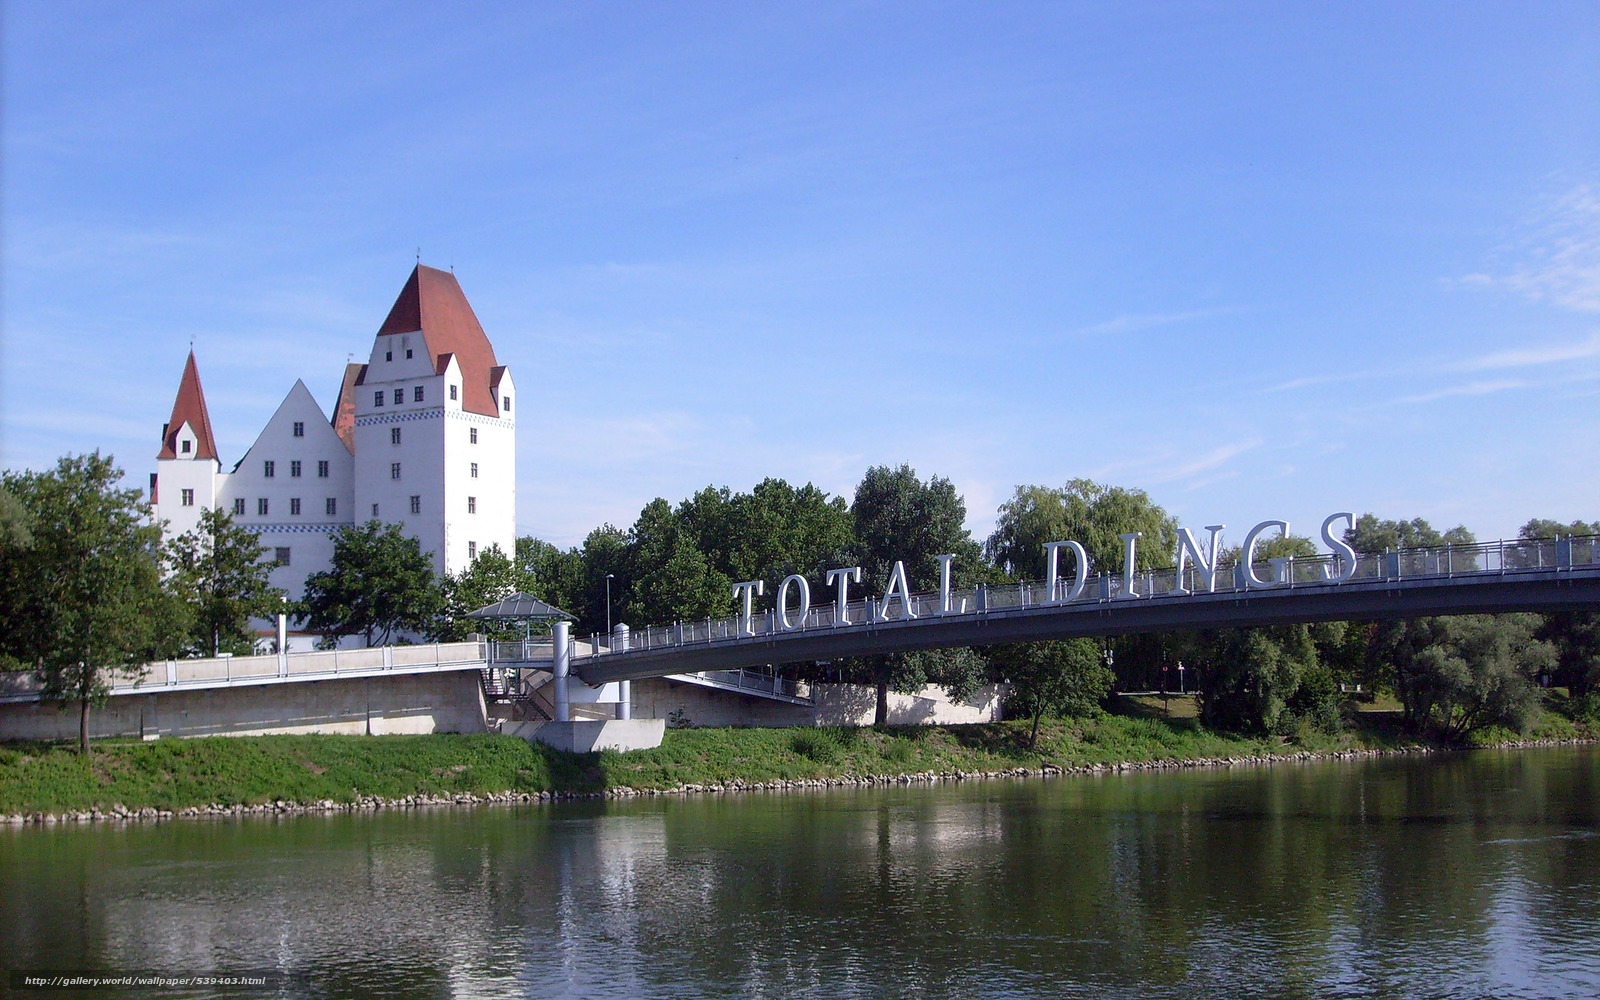 Download wallpaper city, Ingolstadt, Germany, castle free desktop ...: gde-fon.com/download/city_ingolstadt_germany_castle_bridge_river...